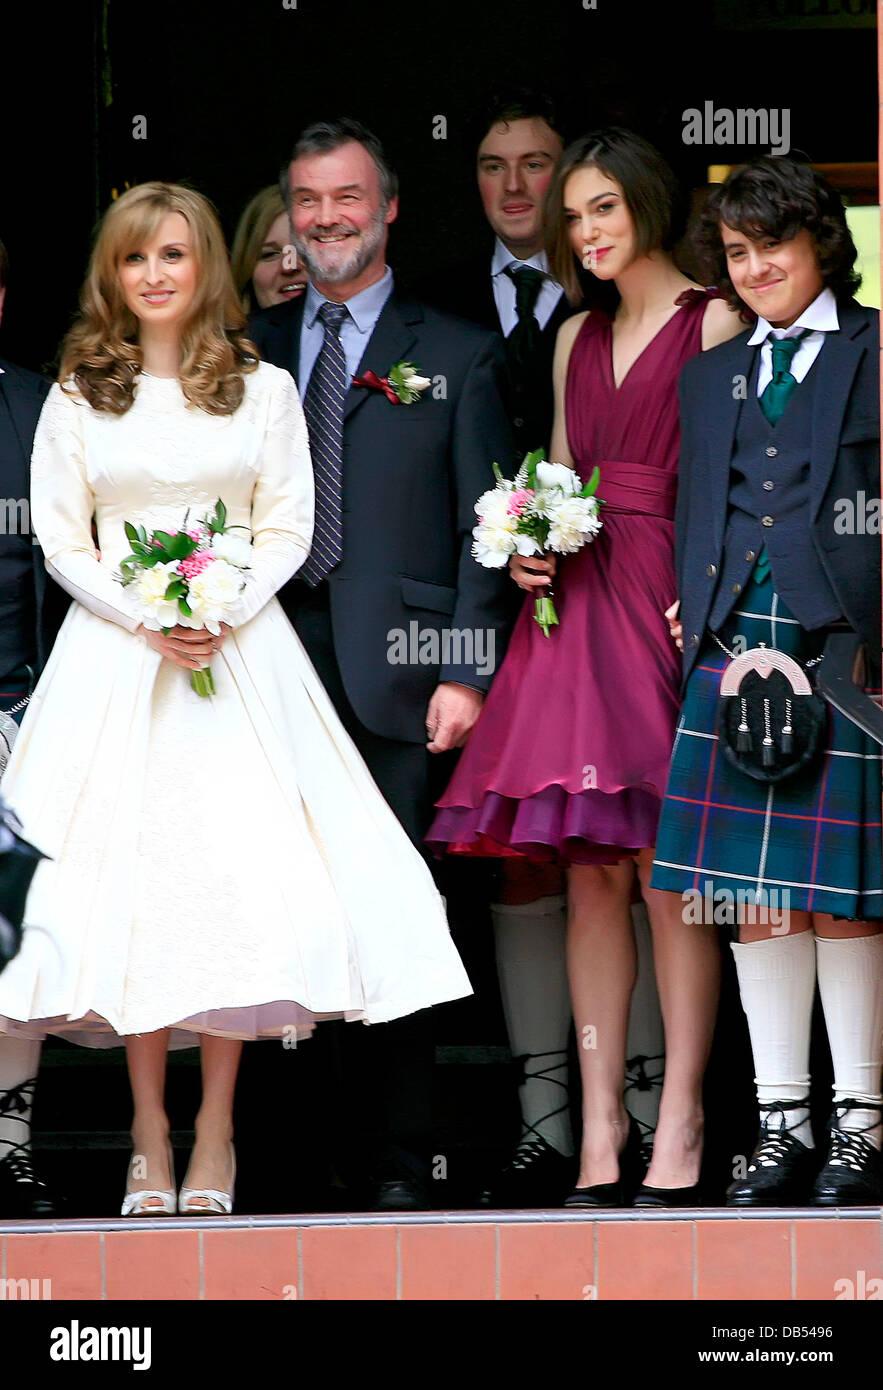 kerry nixon and keira knightley the wedding of caleb knightley and